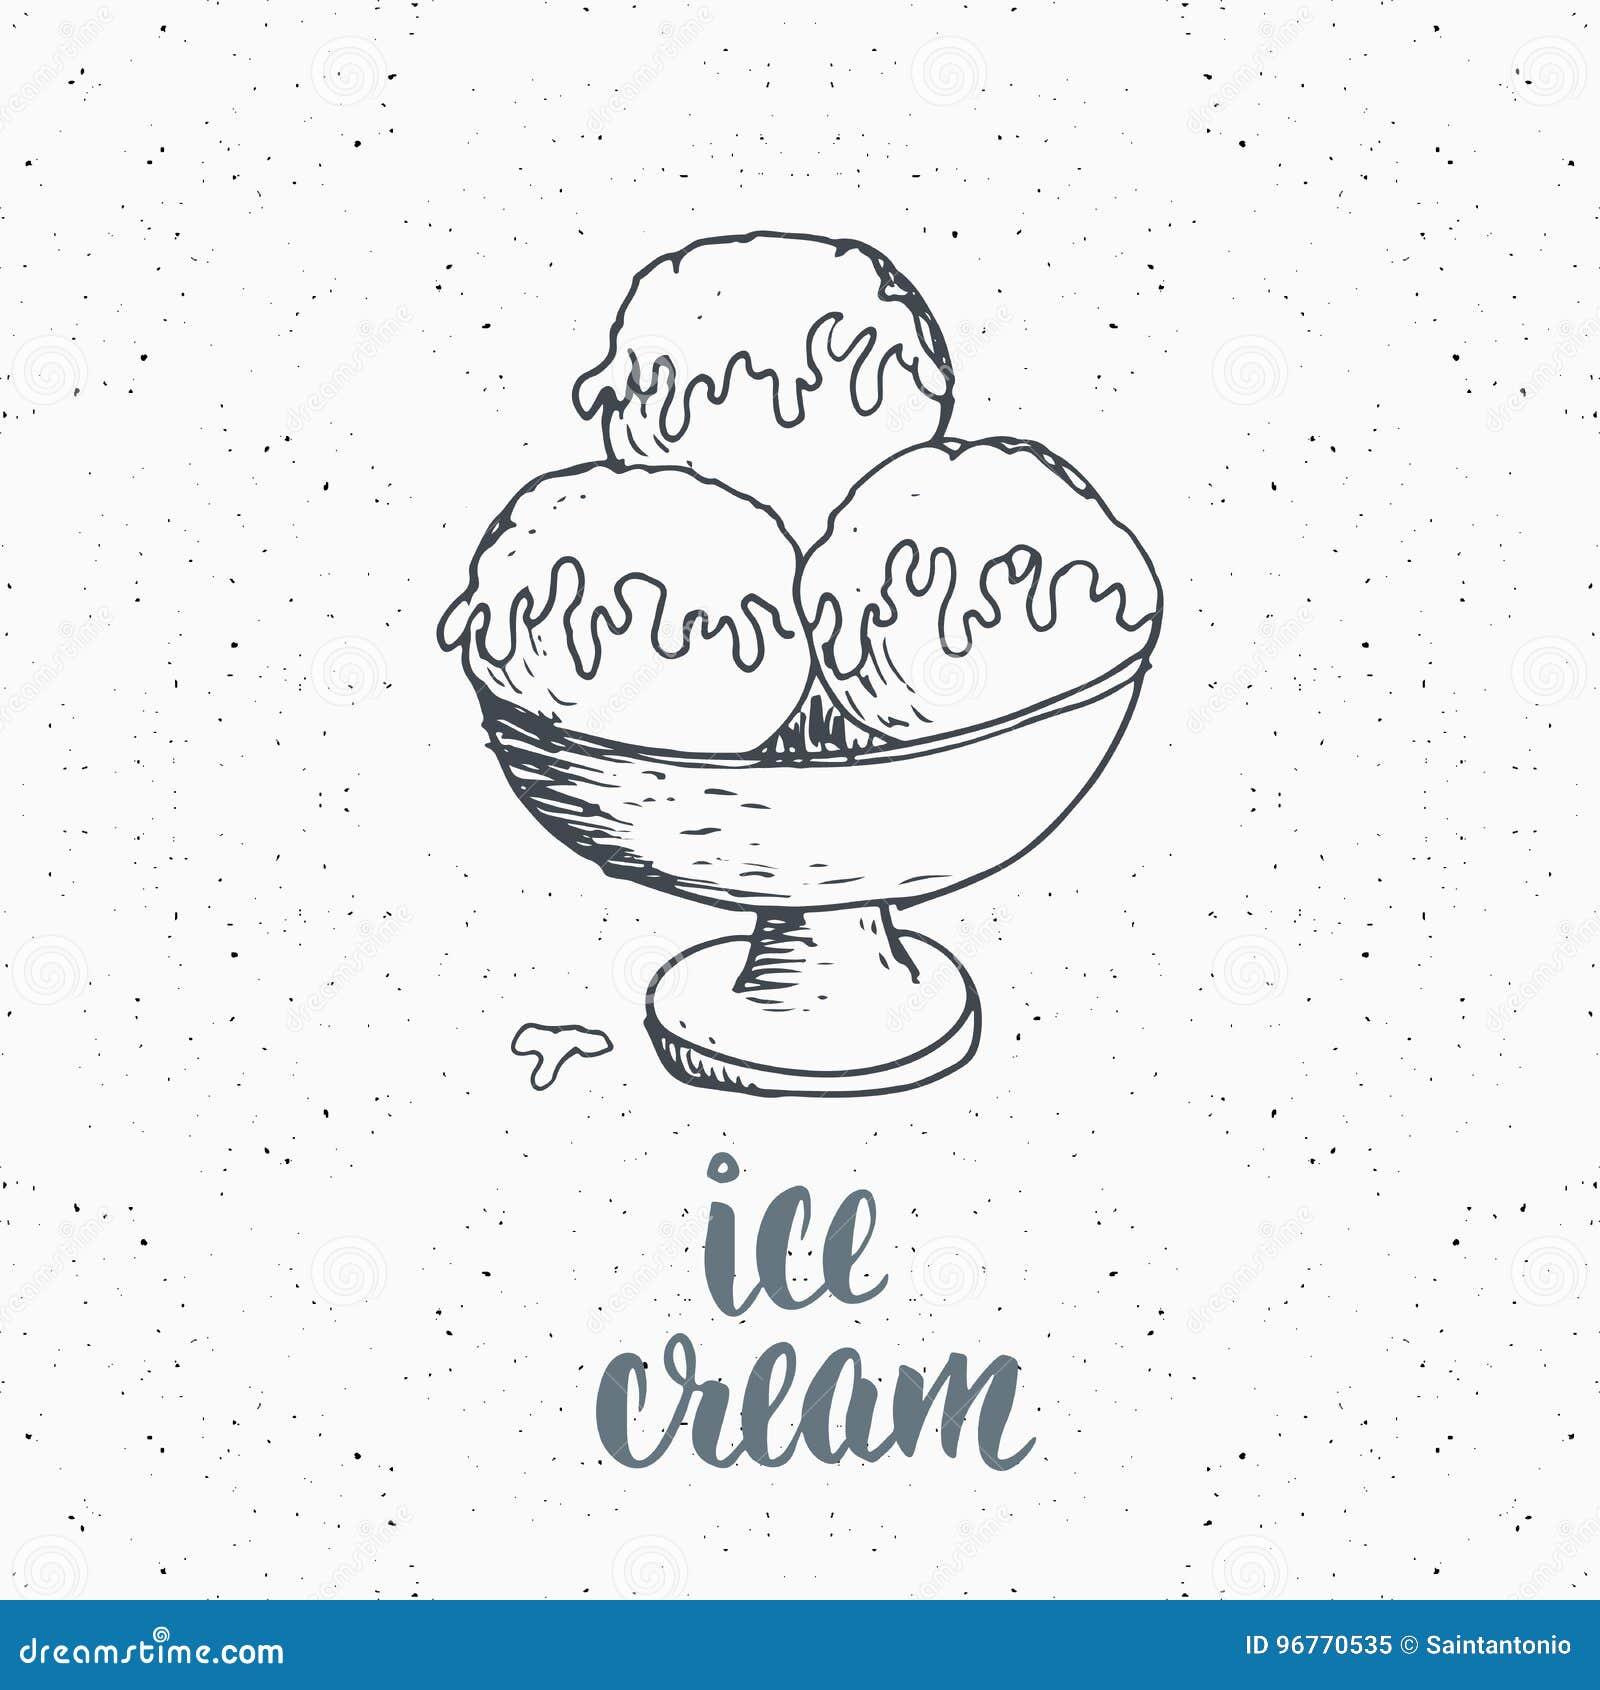 Ice cream with lettering sketch vintage label hand drawn grunge download ice cream with lettering sketch vintage label hand drawn grunge textured badge altavistaventures Choice Image